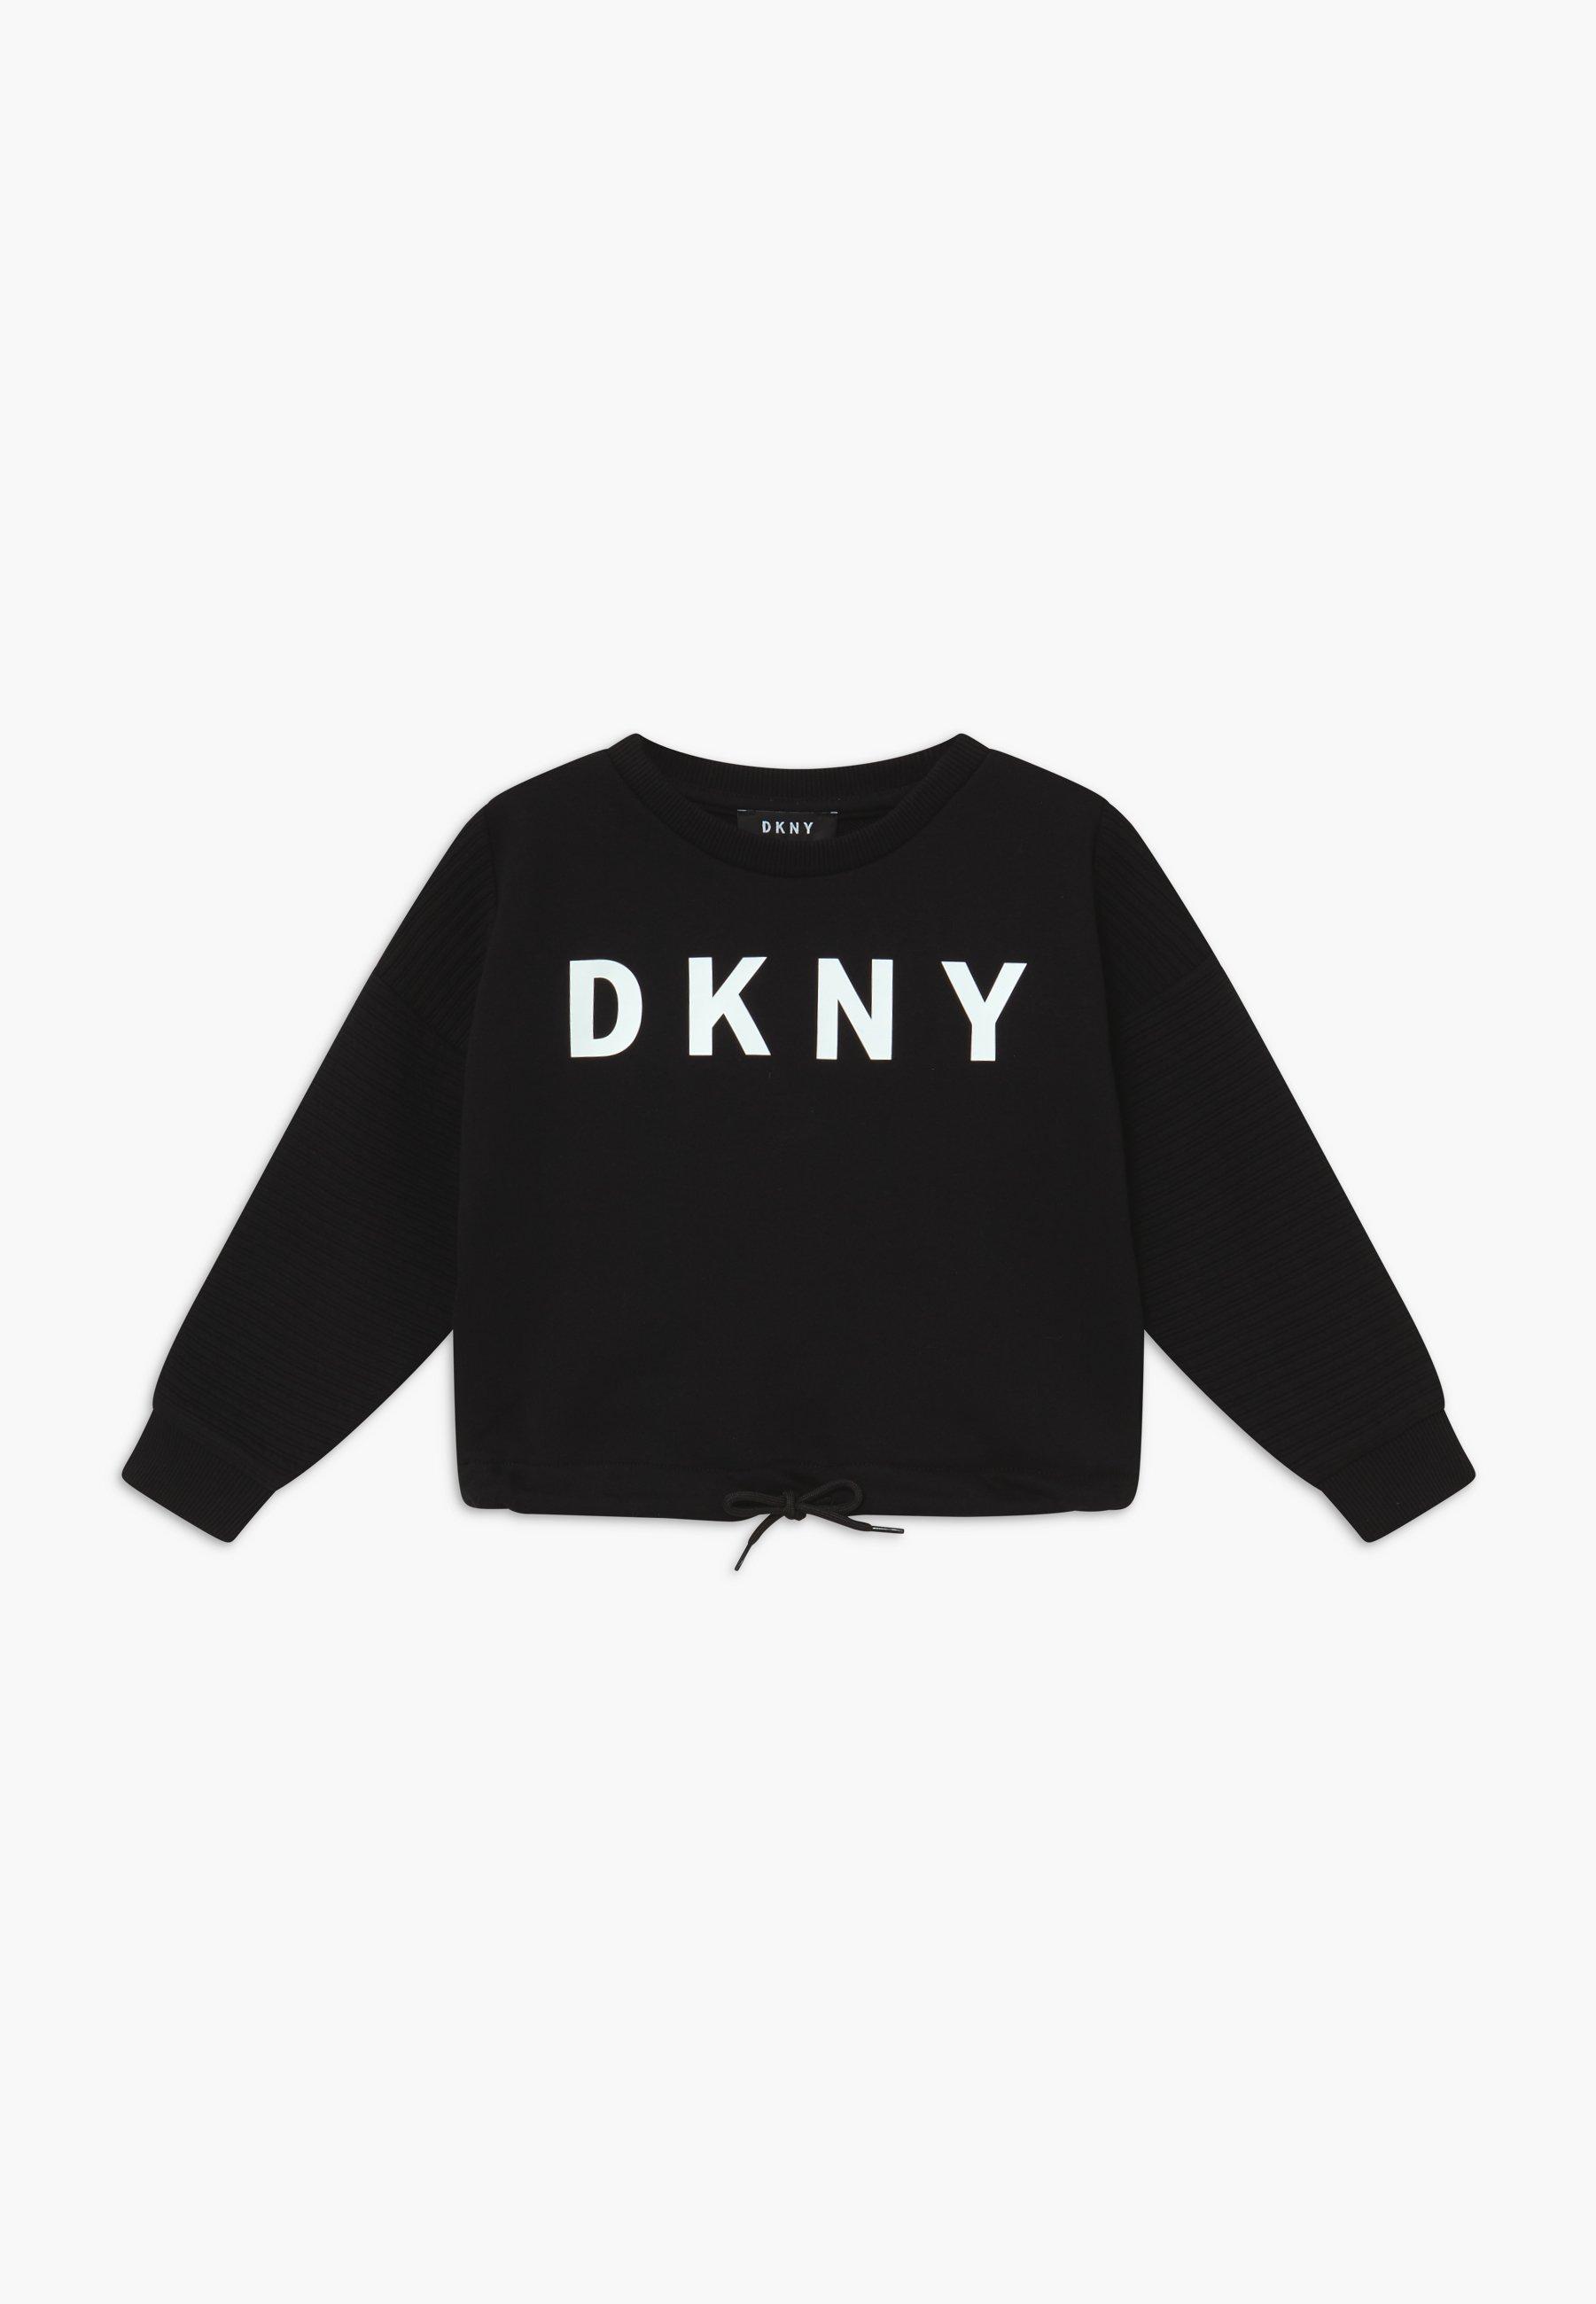 Große Förderung DKNY Sweatshirt - black | Damenbekleidung 2020